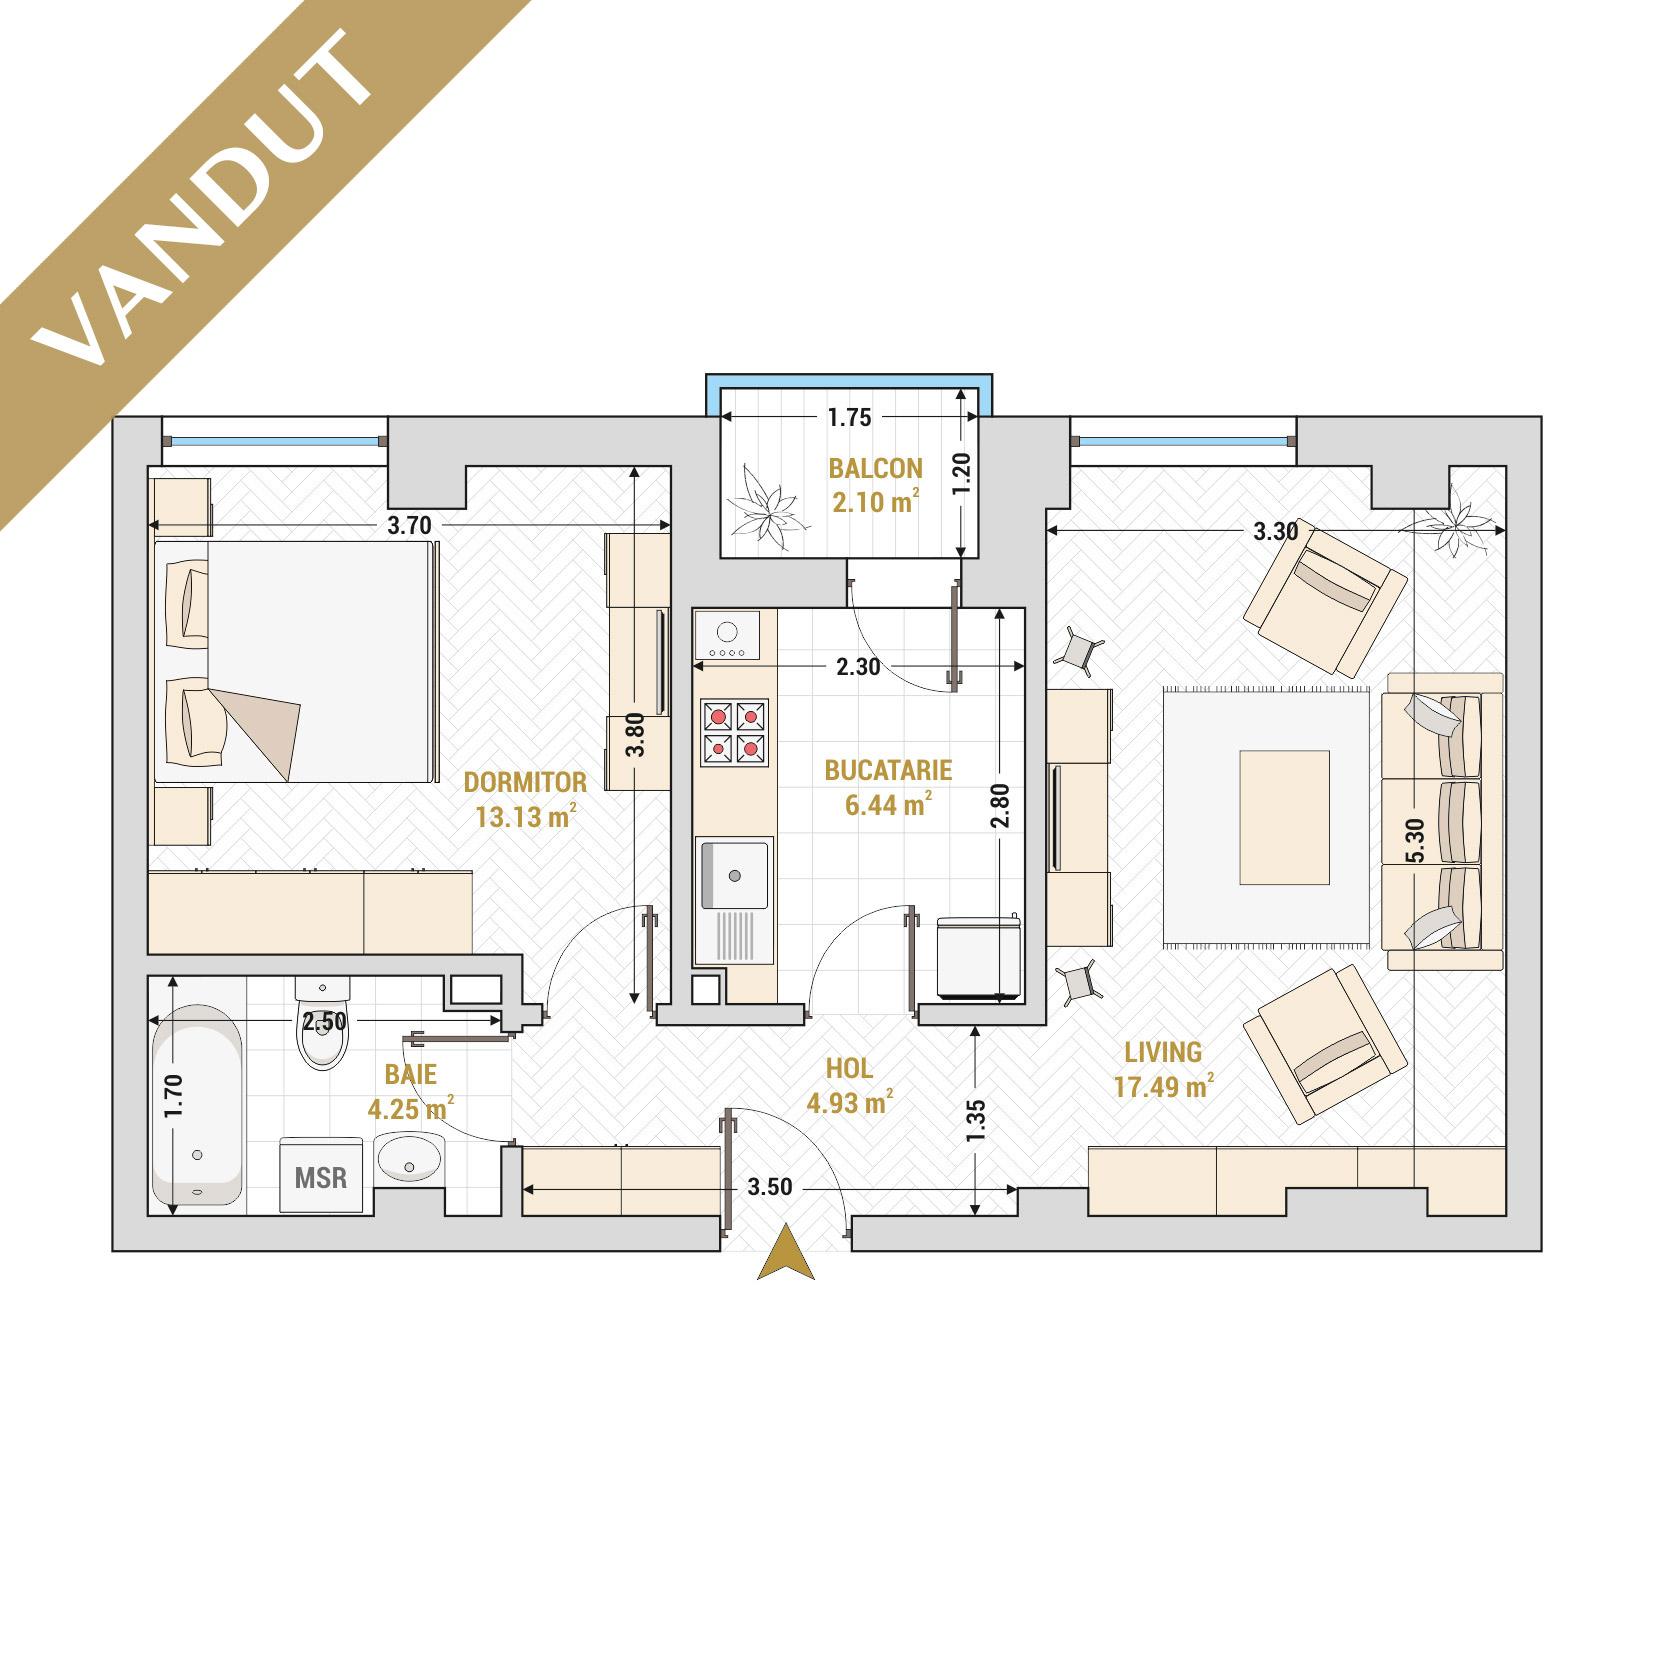 Apartament 2 camere de vanzare Bucuresti - Catedral Residence - Marriott, Piata Unirii, 13 Septembrie, Izvor - Tip 1 - T2A - V